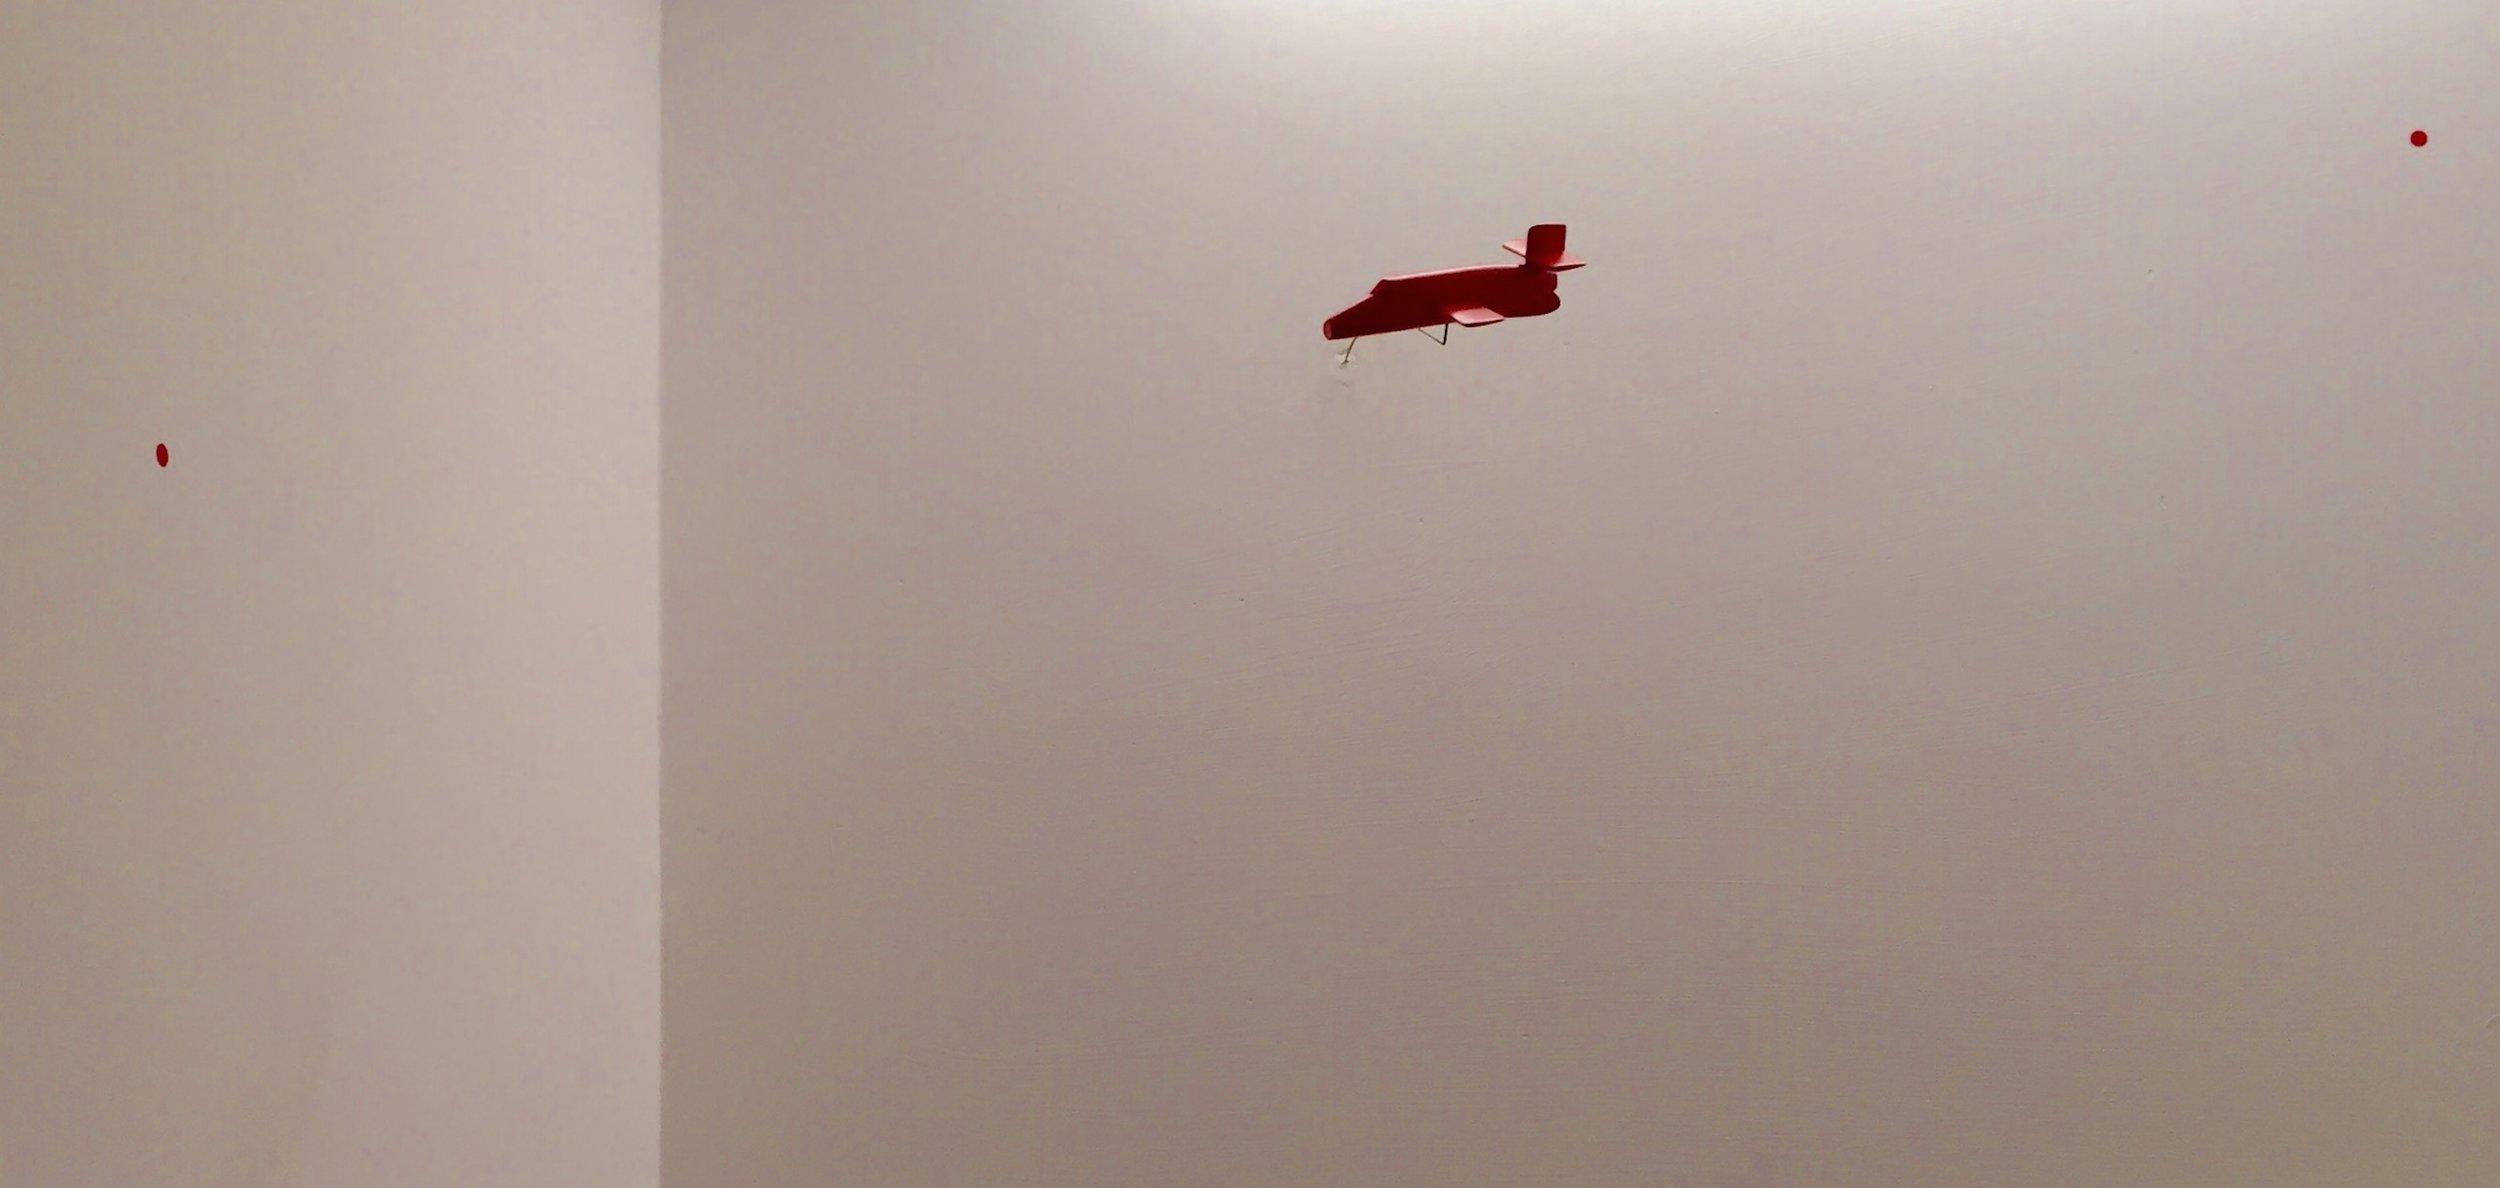 mochetti aereo rosso.jpg